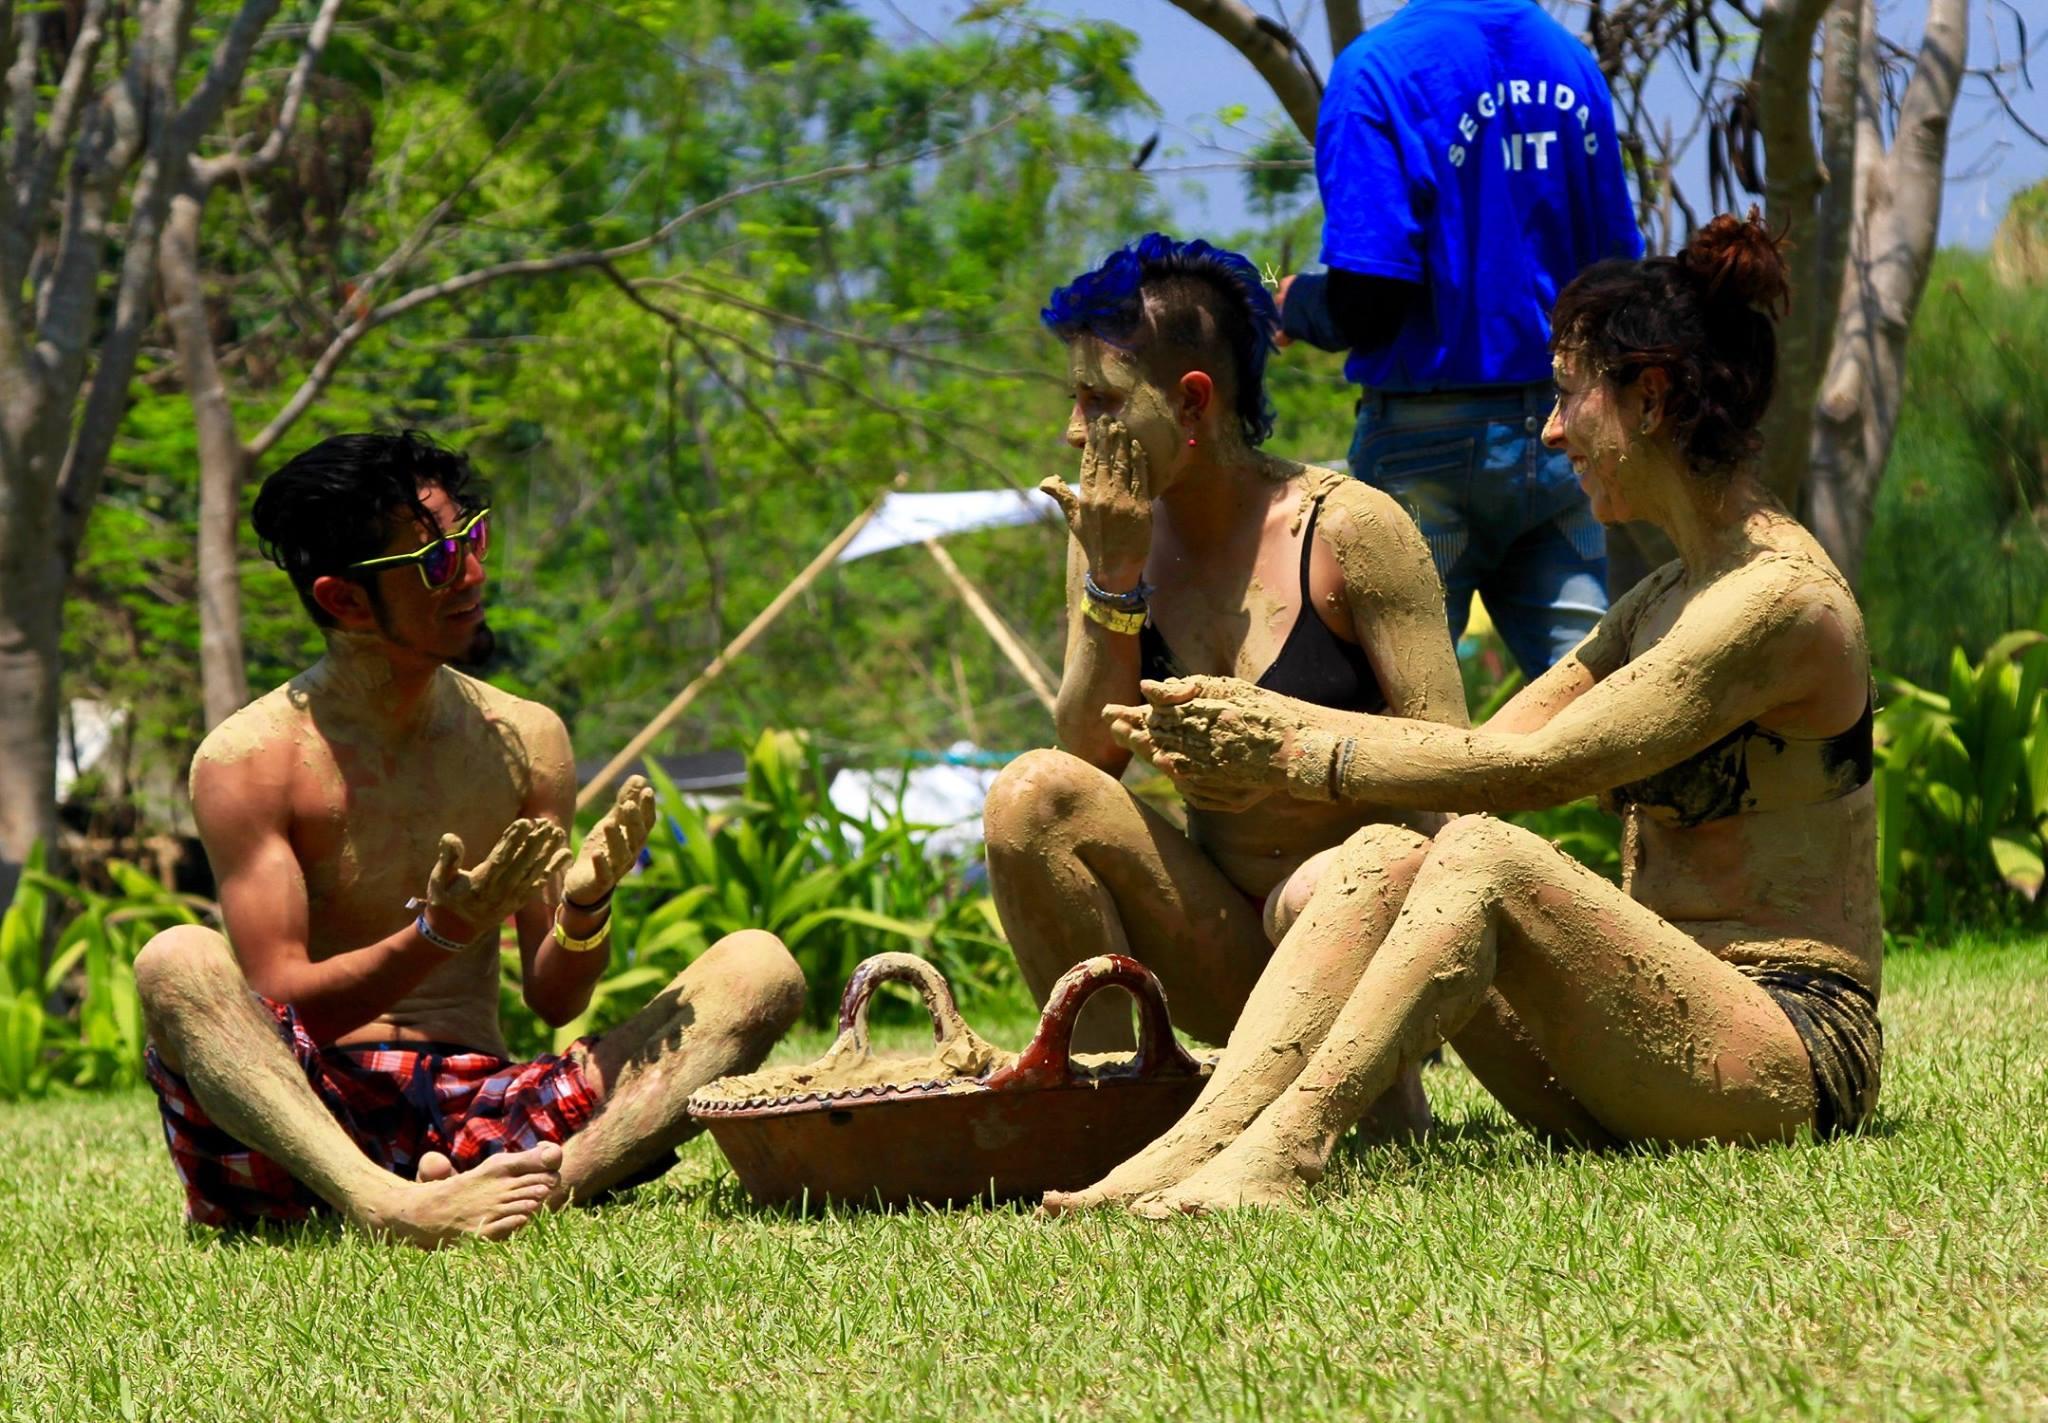 Mayan Clay Ometeotl